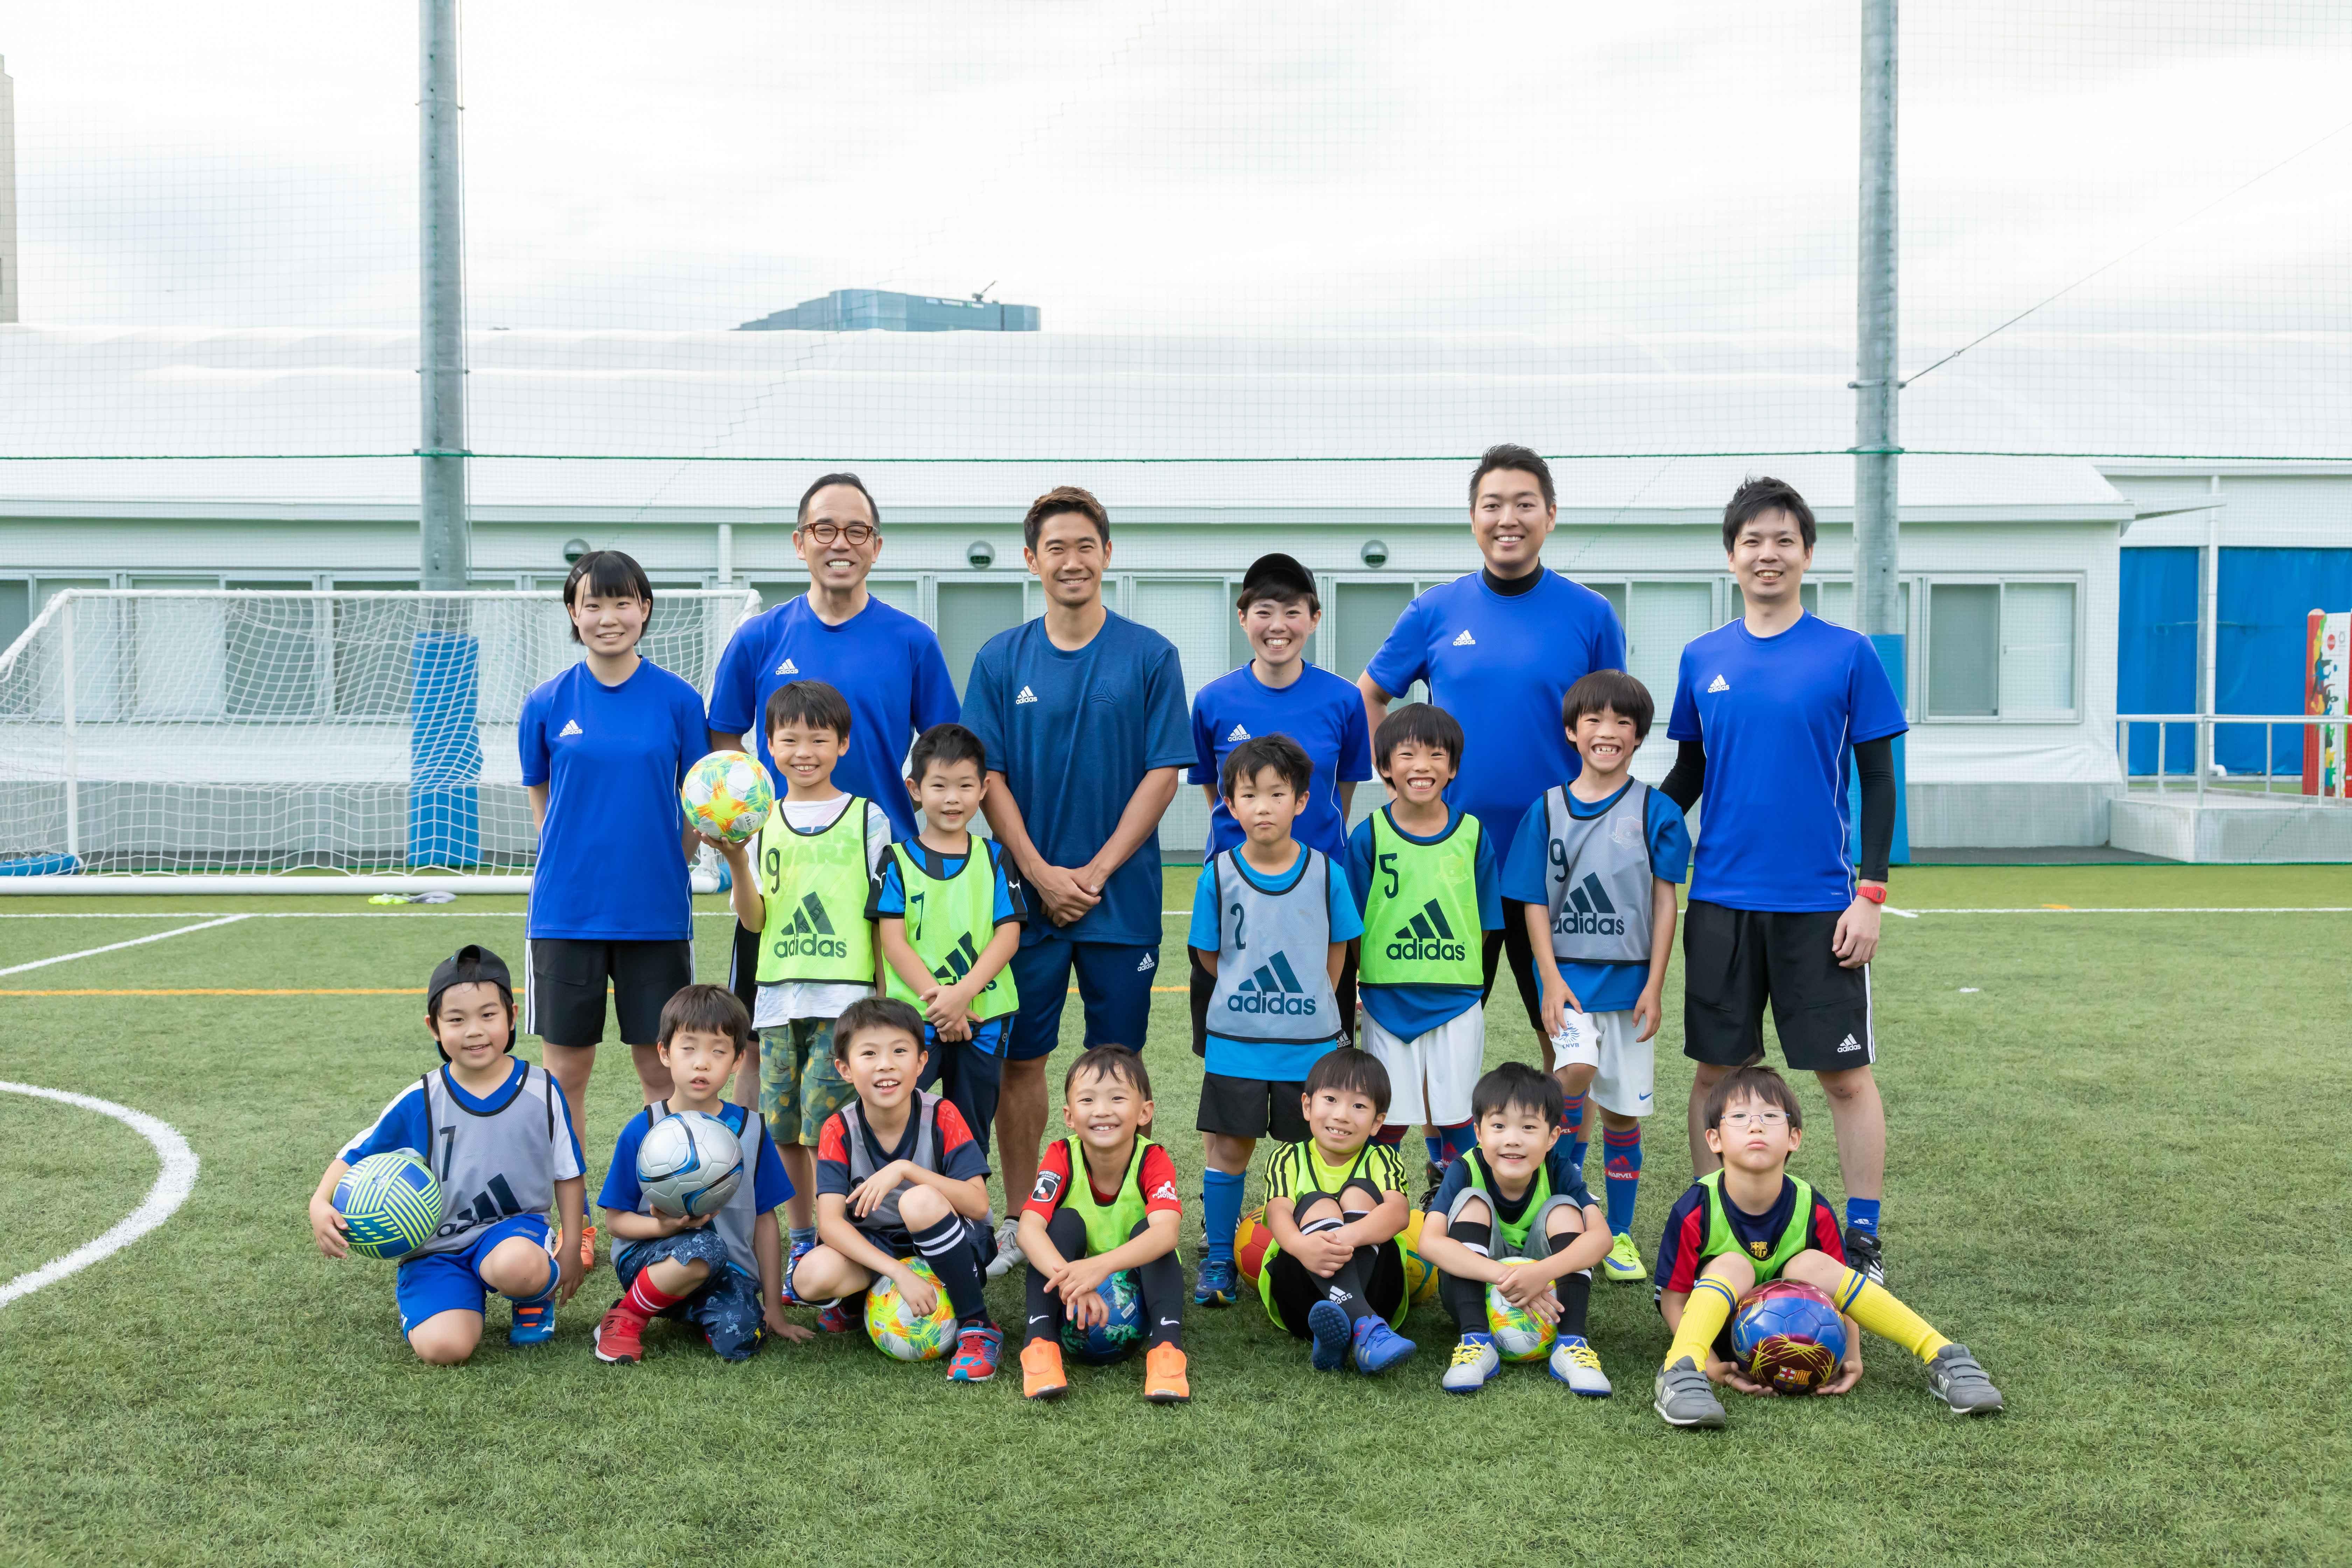 Hanaspoサッカー教室 大宮校